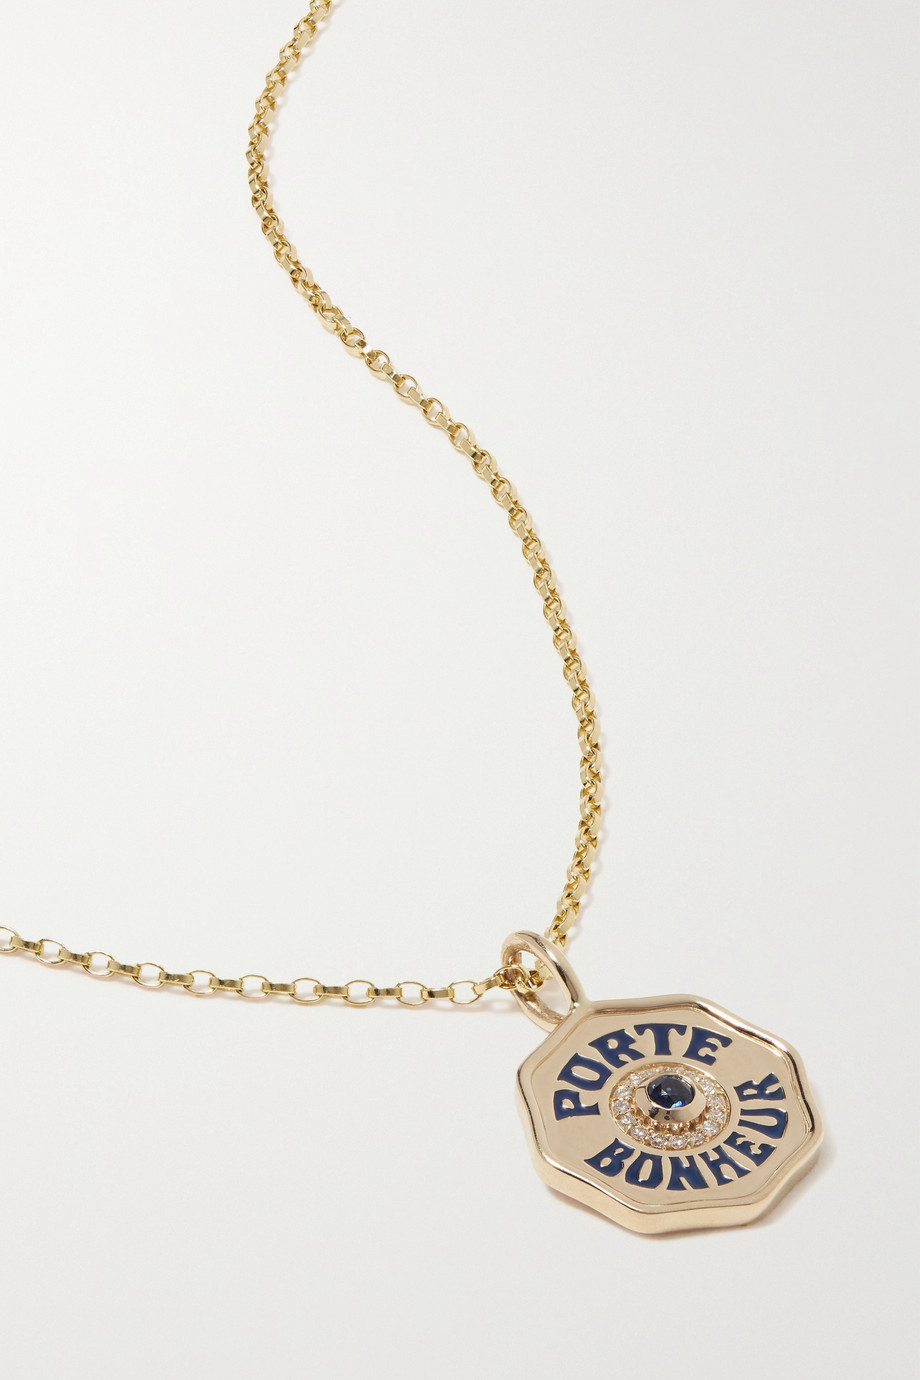 Marlo Laz Mini Porte Bonheur 14-karat gold, enamel, sapphire and diamond necklace